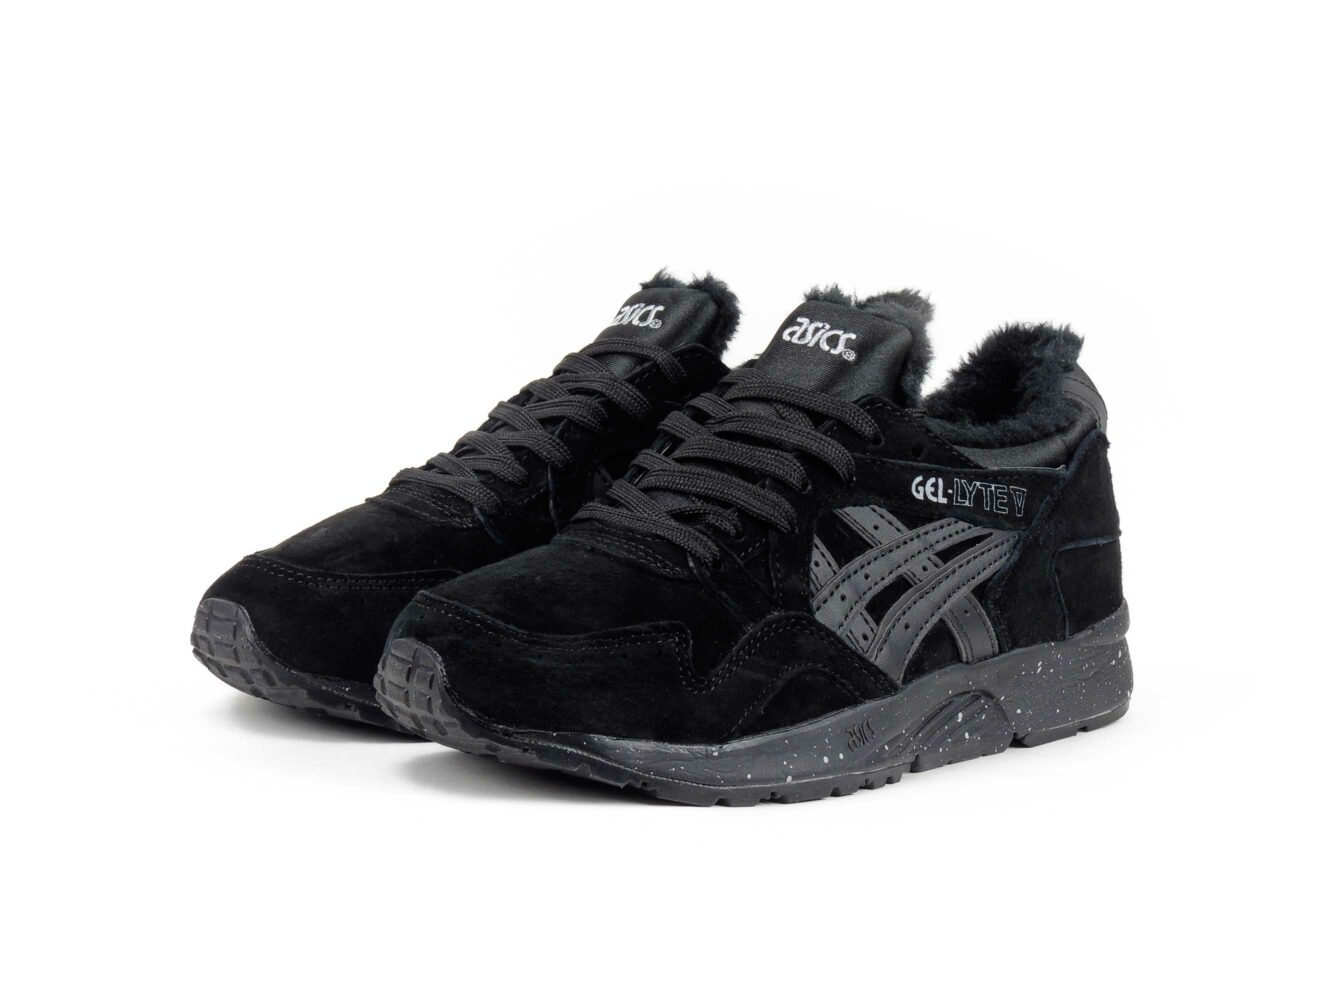 asics gel-lyte V all black winter H5R2N_9090 купить